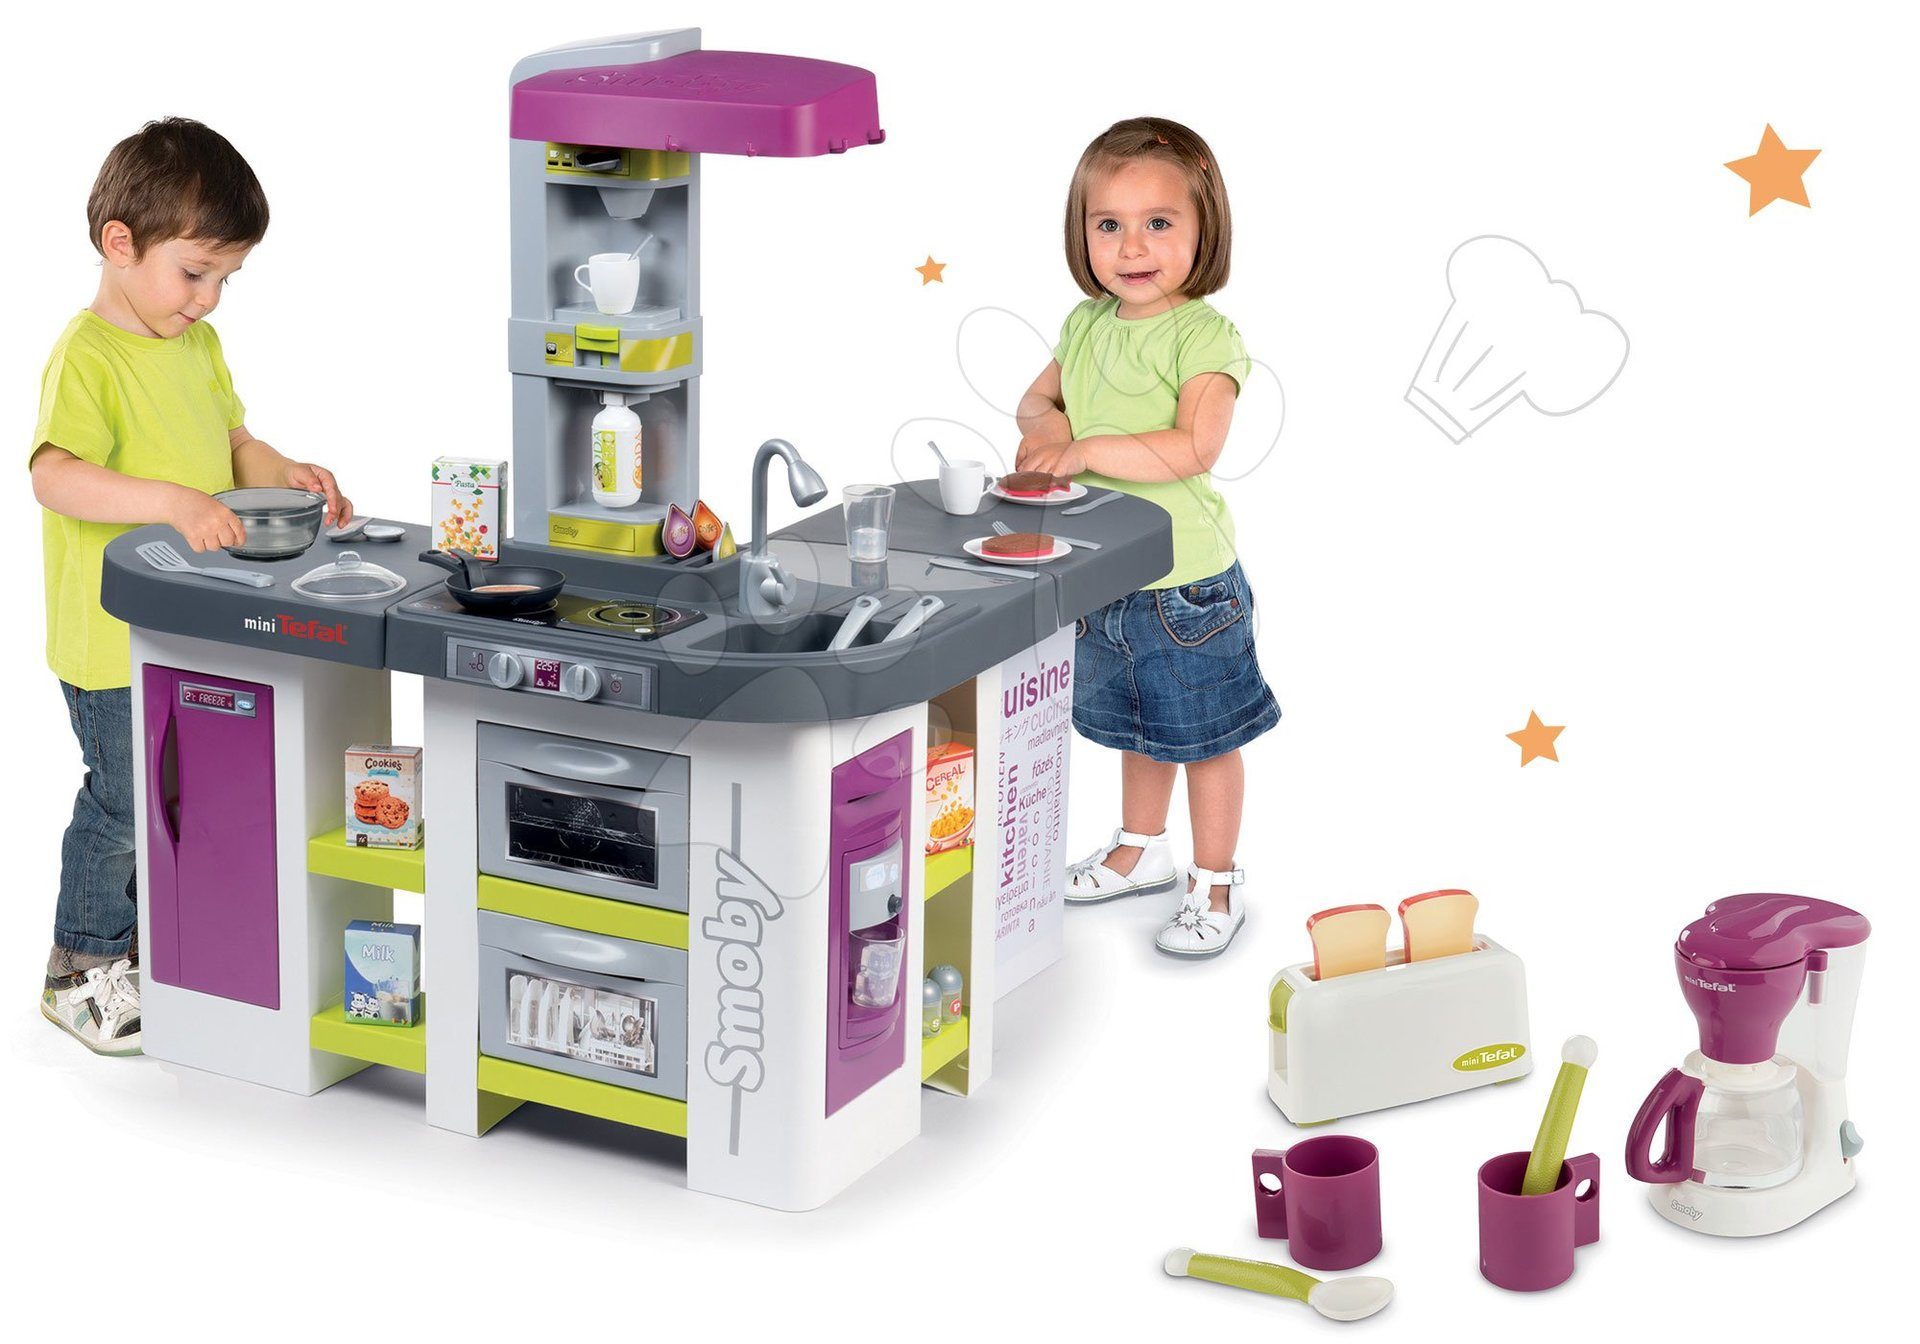 Set kuchynka elektronická Tefal Studio XXL Bubble Smoby s magickým bublaním a raňajkový set s kávovarom a toasterom